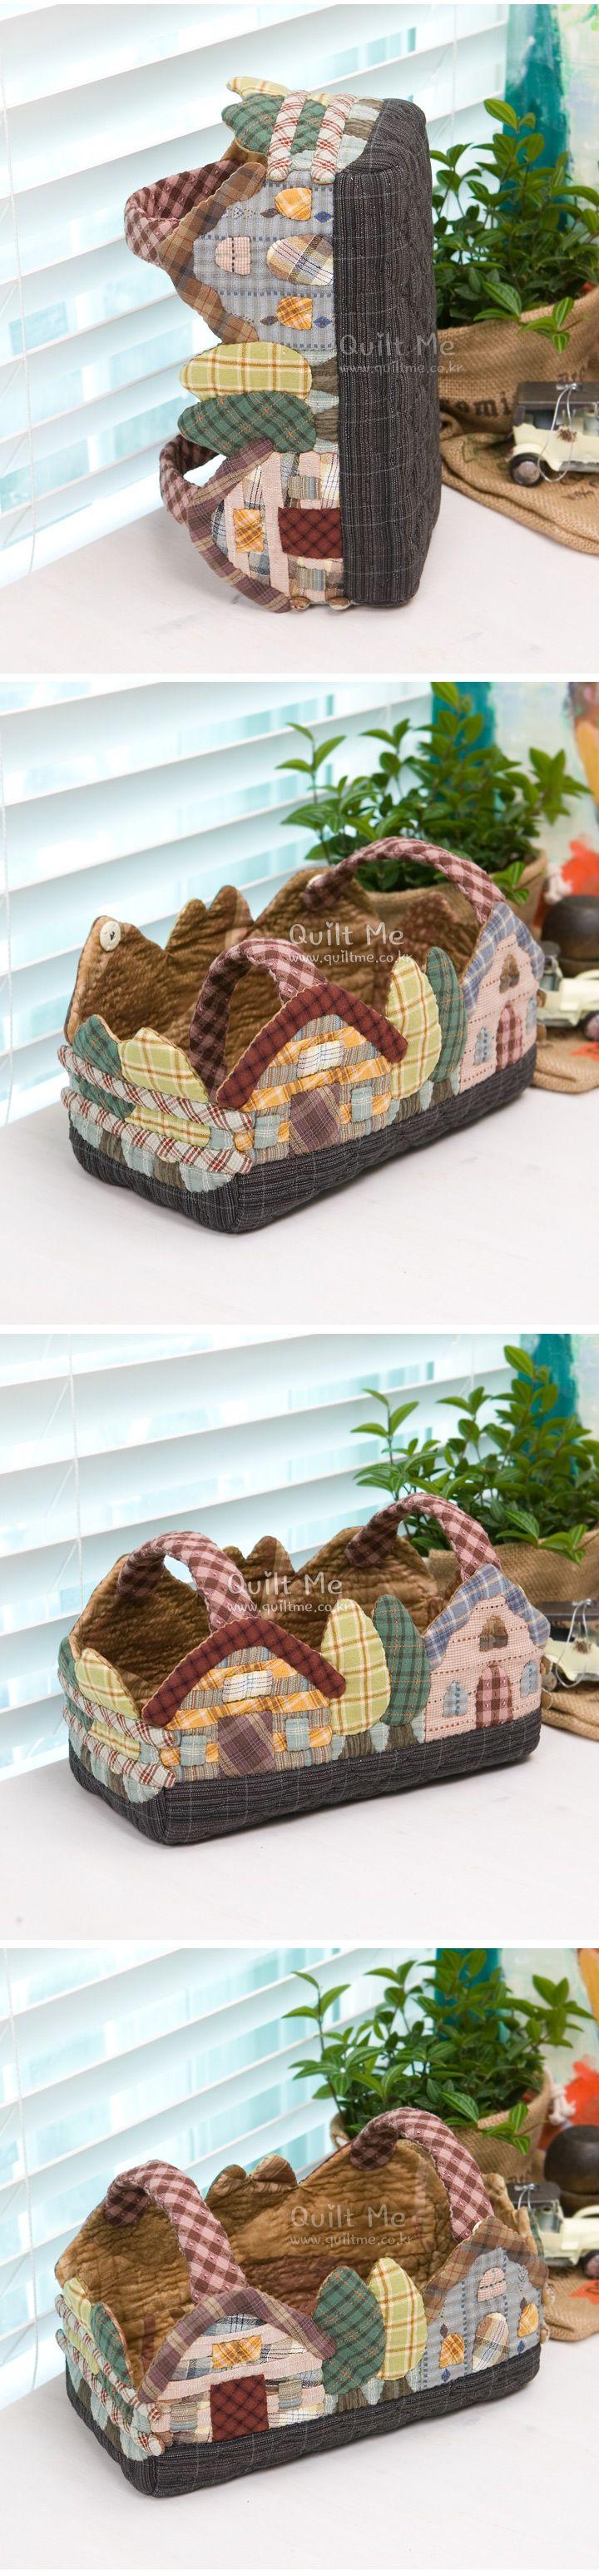 Houses basket-shaped tissue case |   퀼트미 [★선착순세일!-하우스 바스켓모양 티슈케이스]